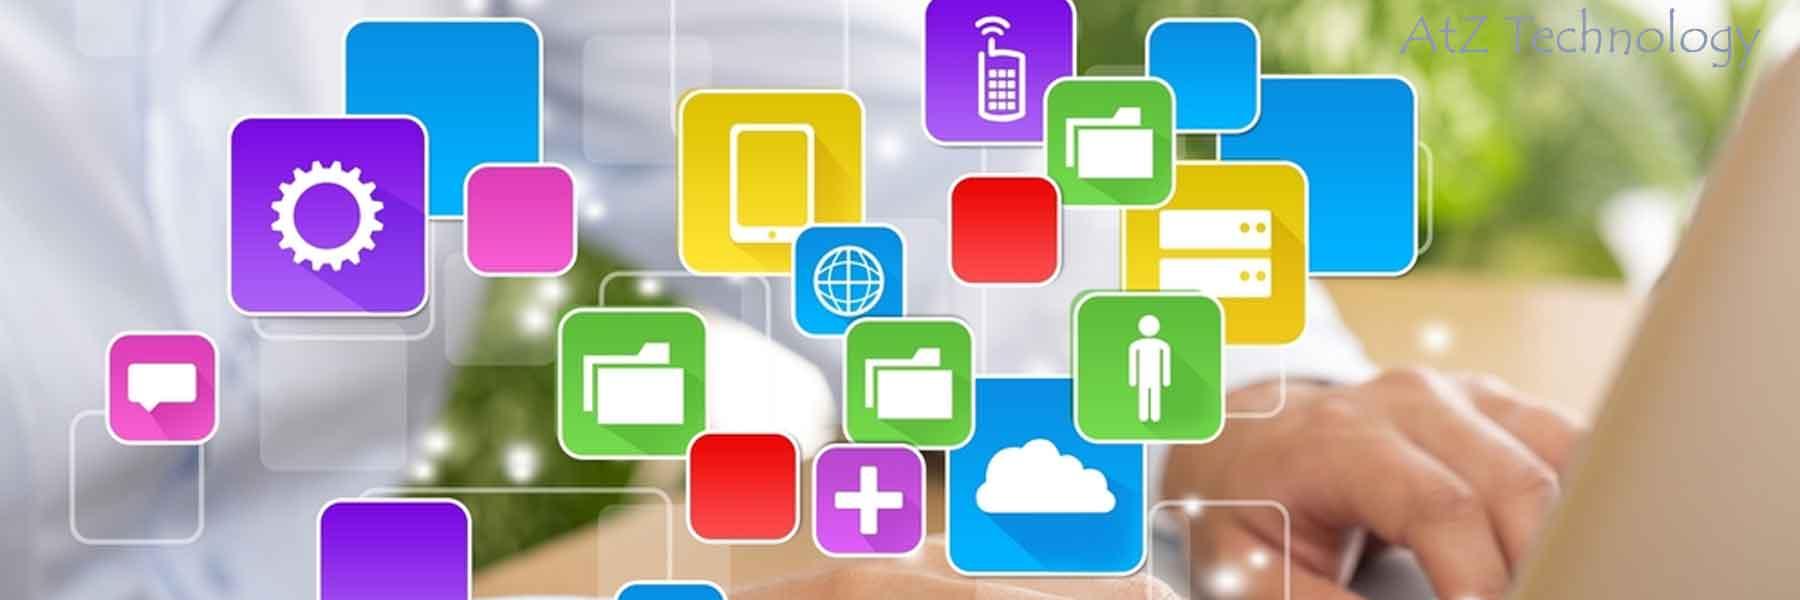 Types of Wireless Technology